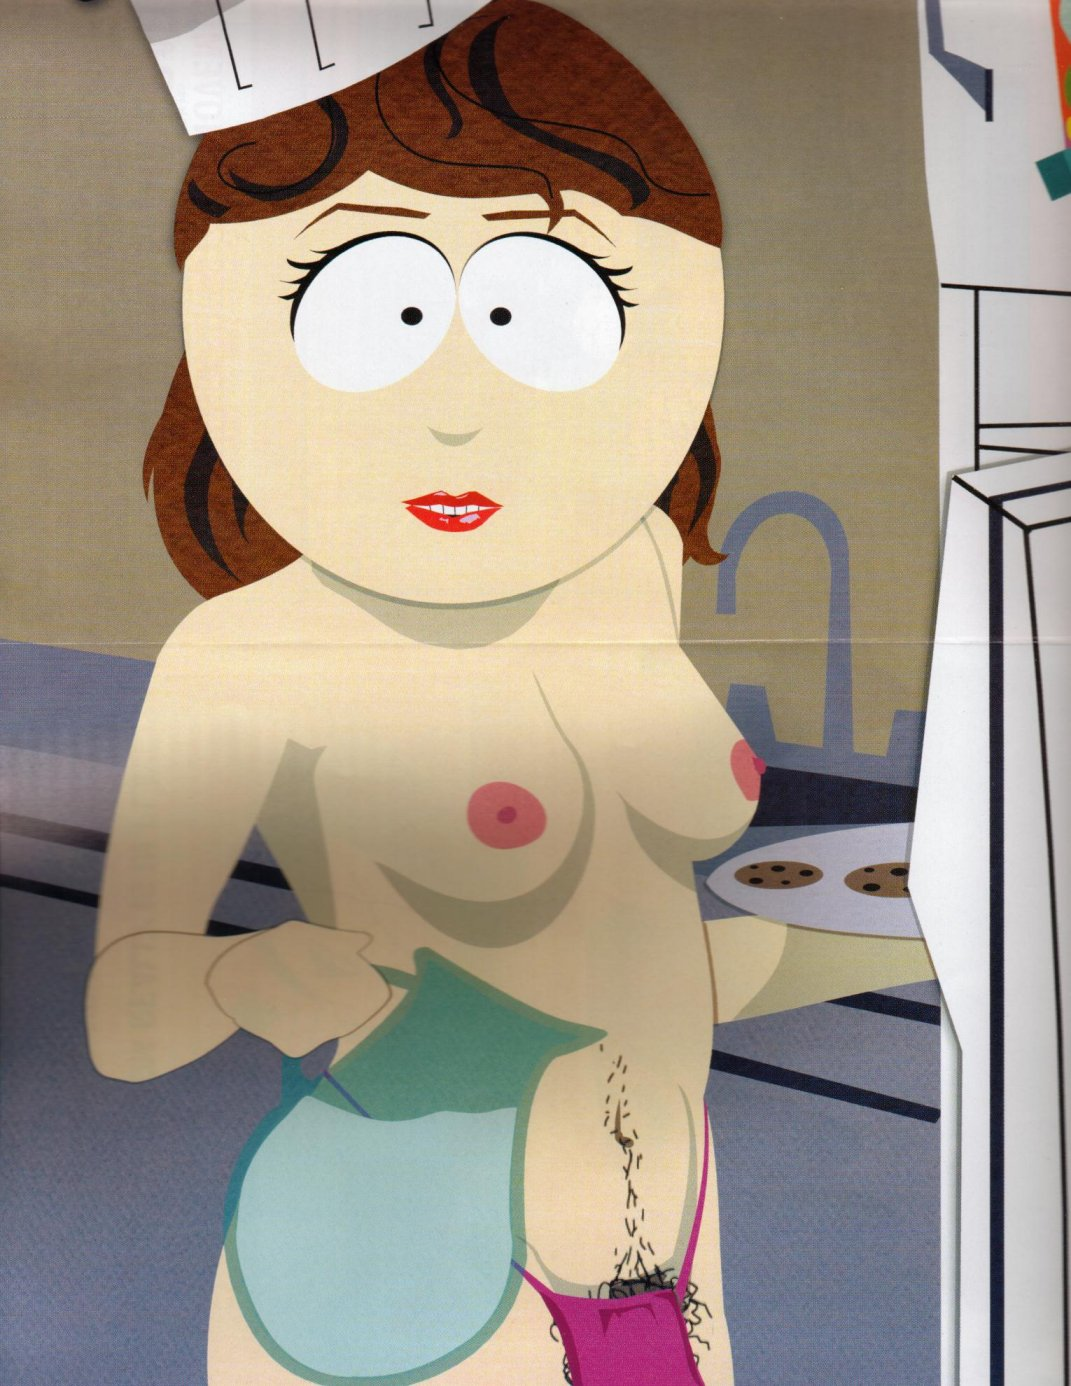 southpark-boobs